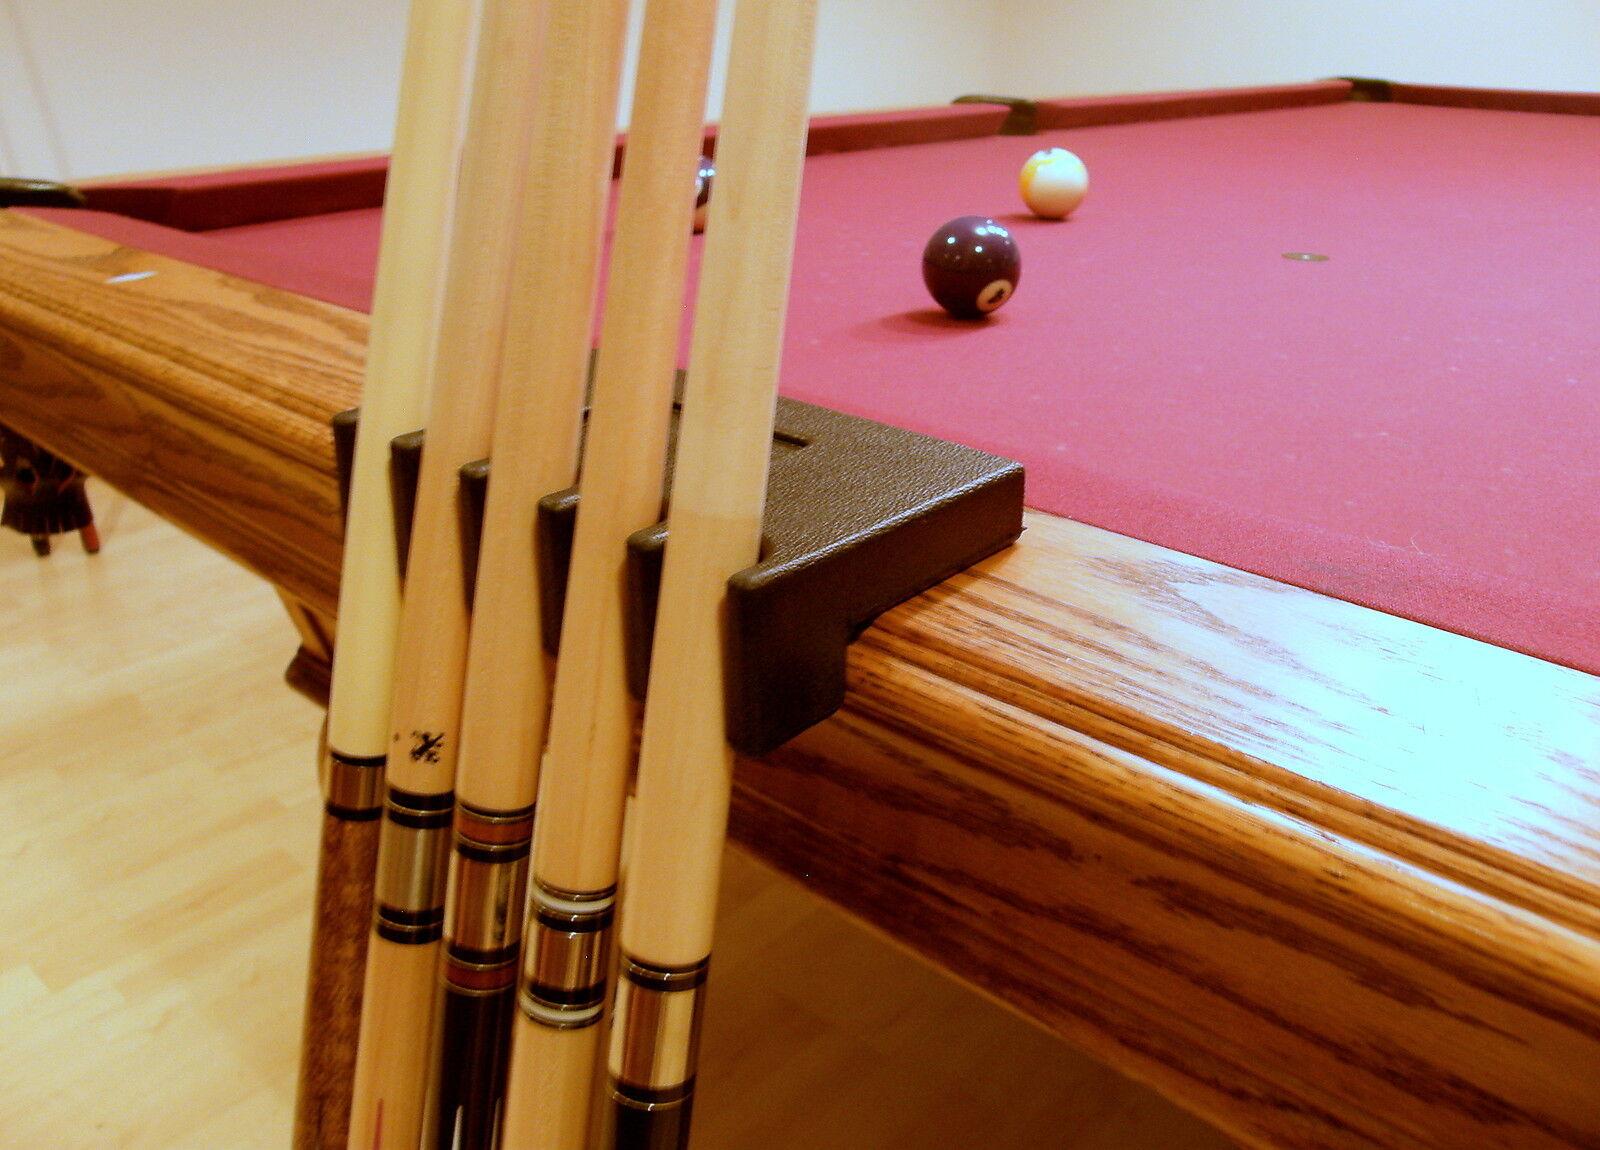 Iszy Billiards Portable 5 Pool Cue Stick Holder Stand Rest Black Ebay